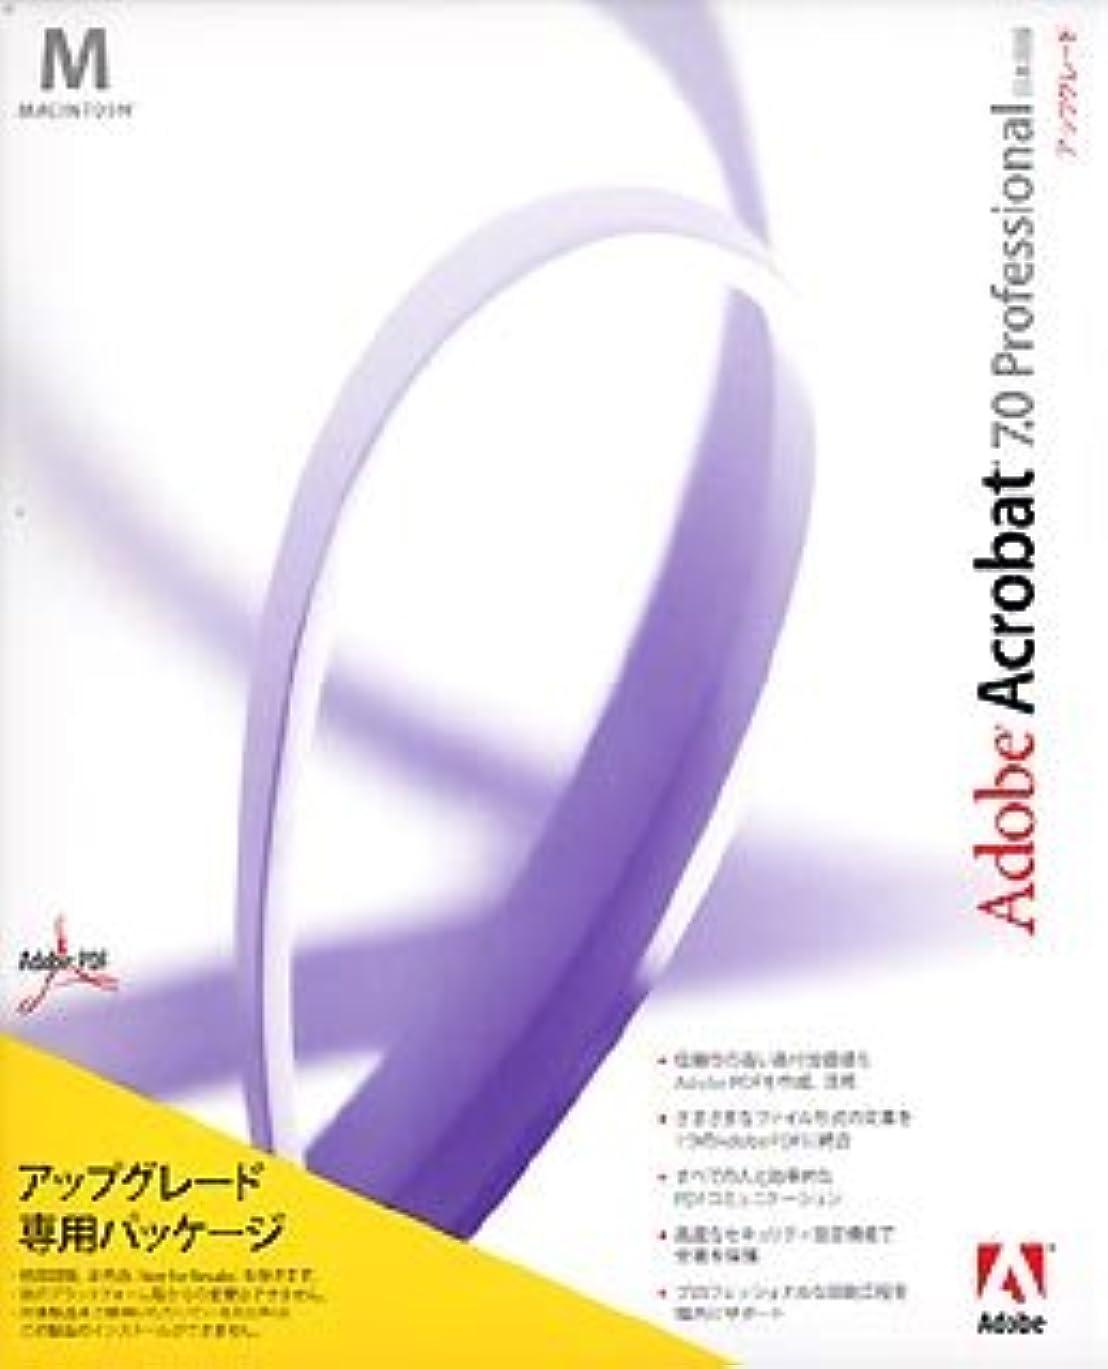 Adobe Acrobat 7.0 Professional 日本語版 Macintosh版 アップグレード専用パッケージ (Professional-Professional)